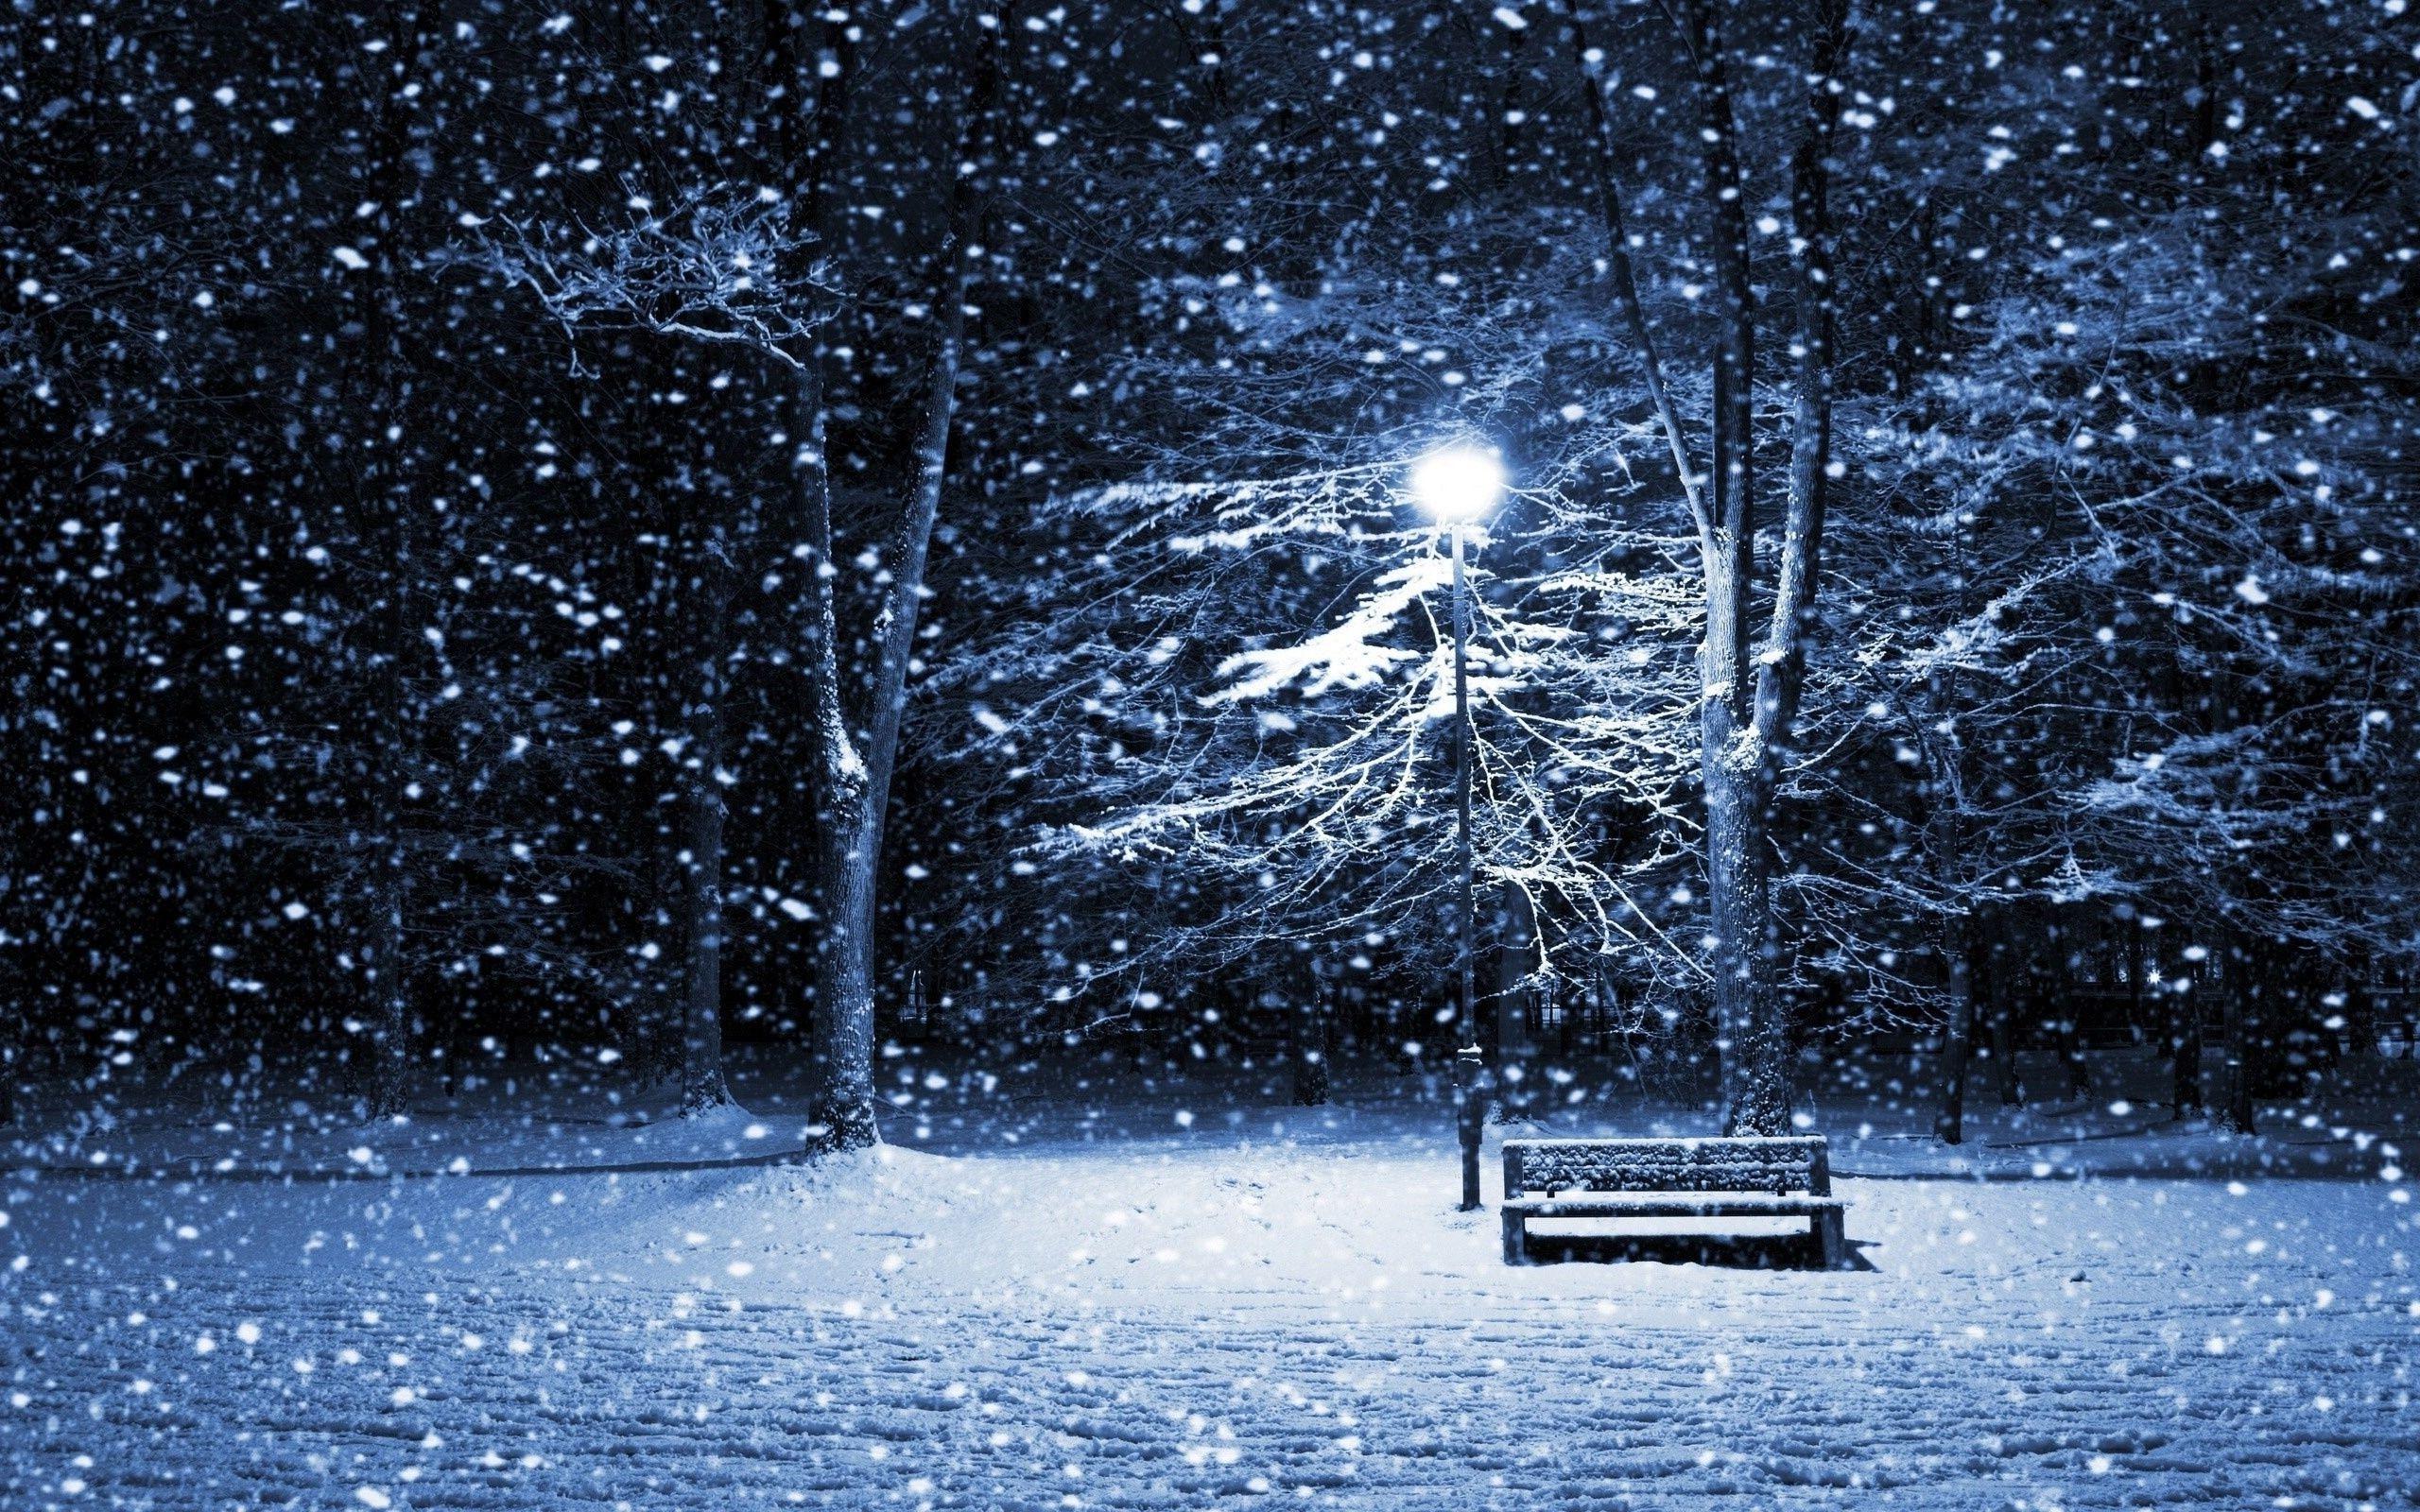 Wallpapersxl Snow Night Hd Widescreen In Nature 1054071 2560x1600